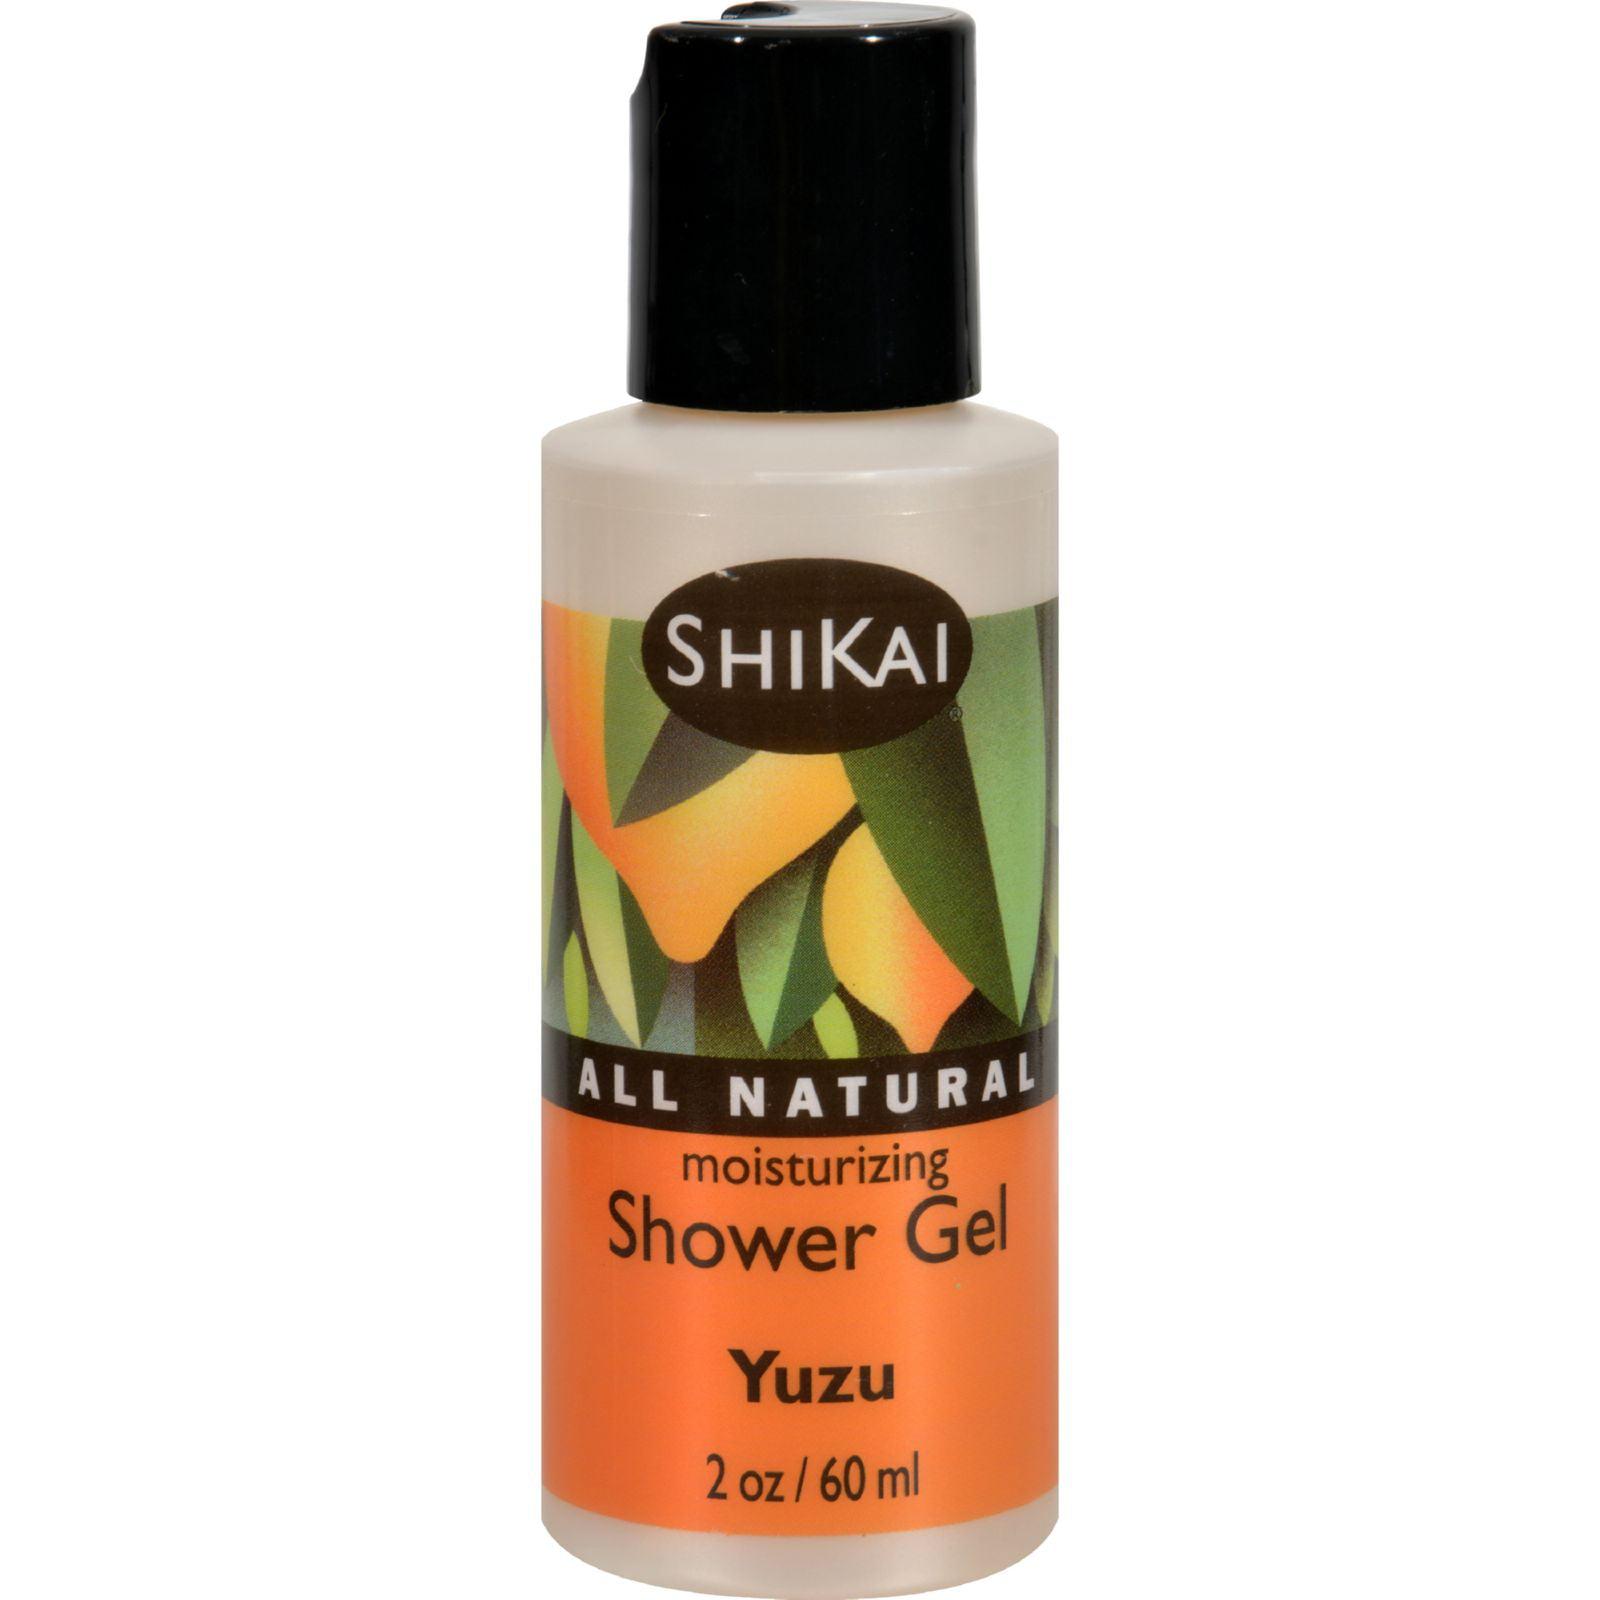 Shikai Products Shower Gel - Yuzu Fruit Trial Size - 2 oz - Case of 12